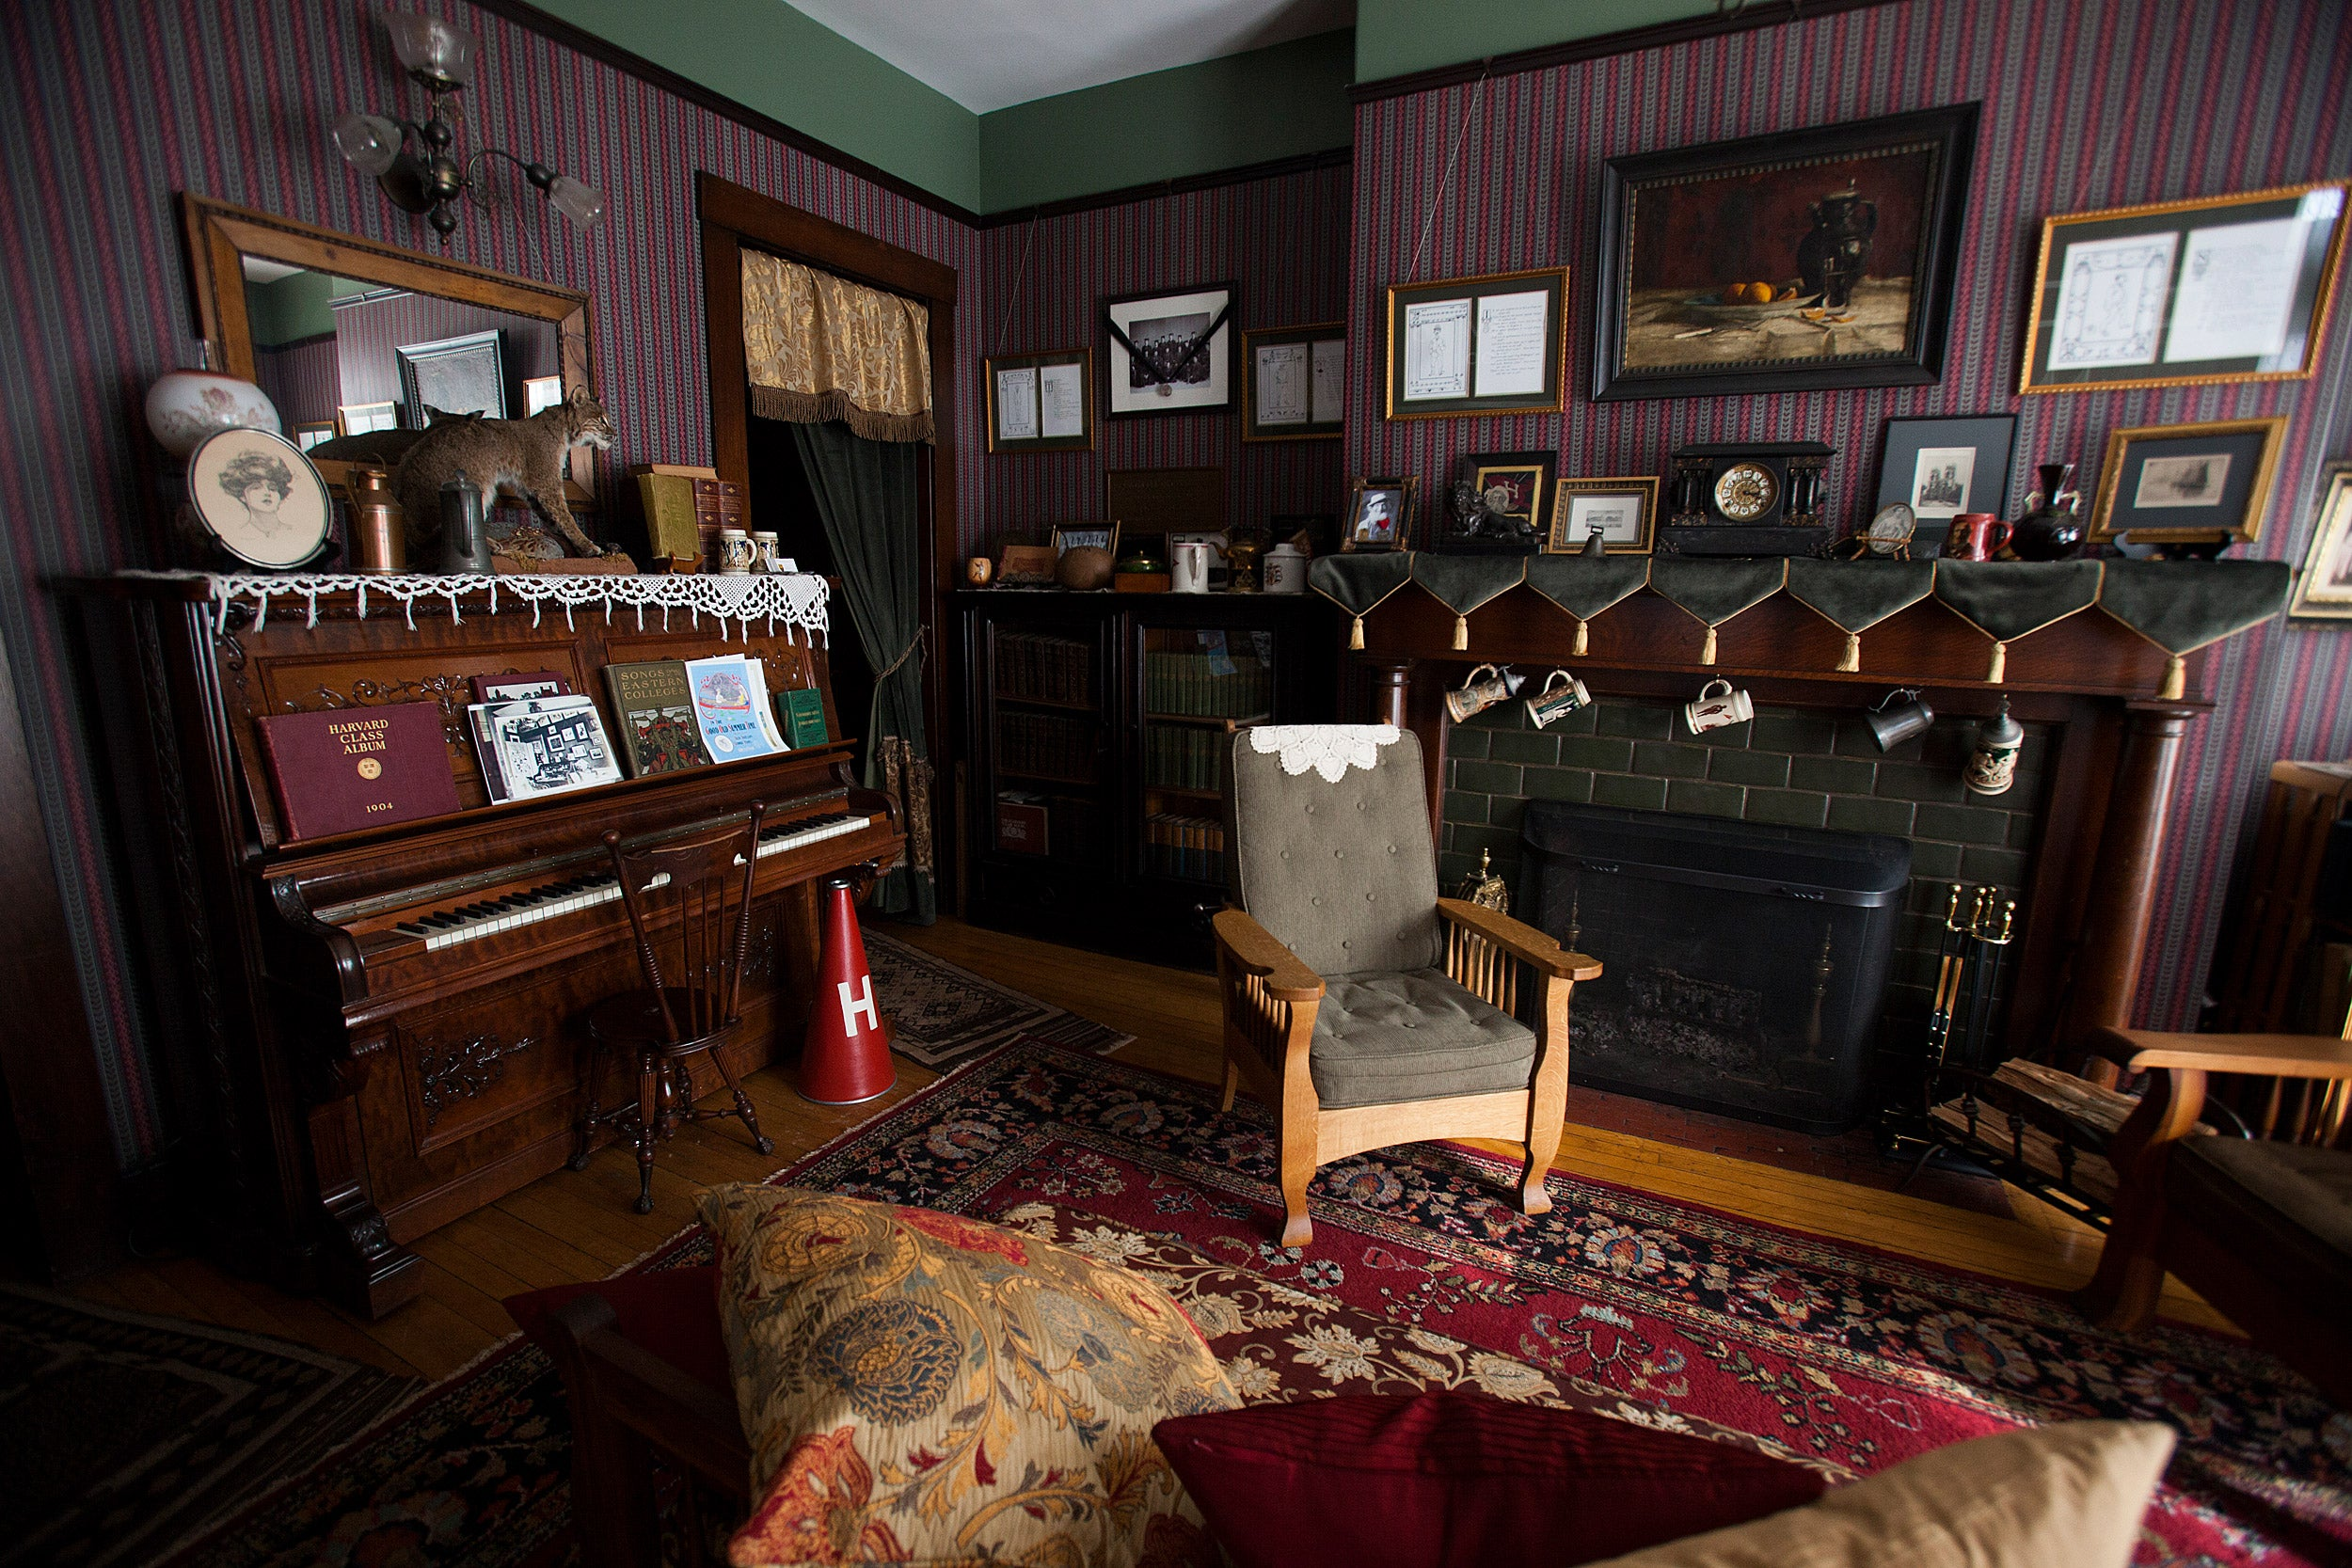 Franklin Delano Roosevelt room at Adams House.